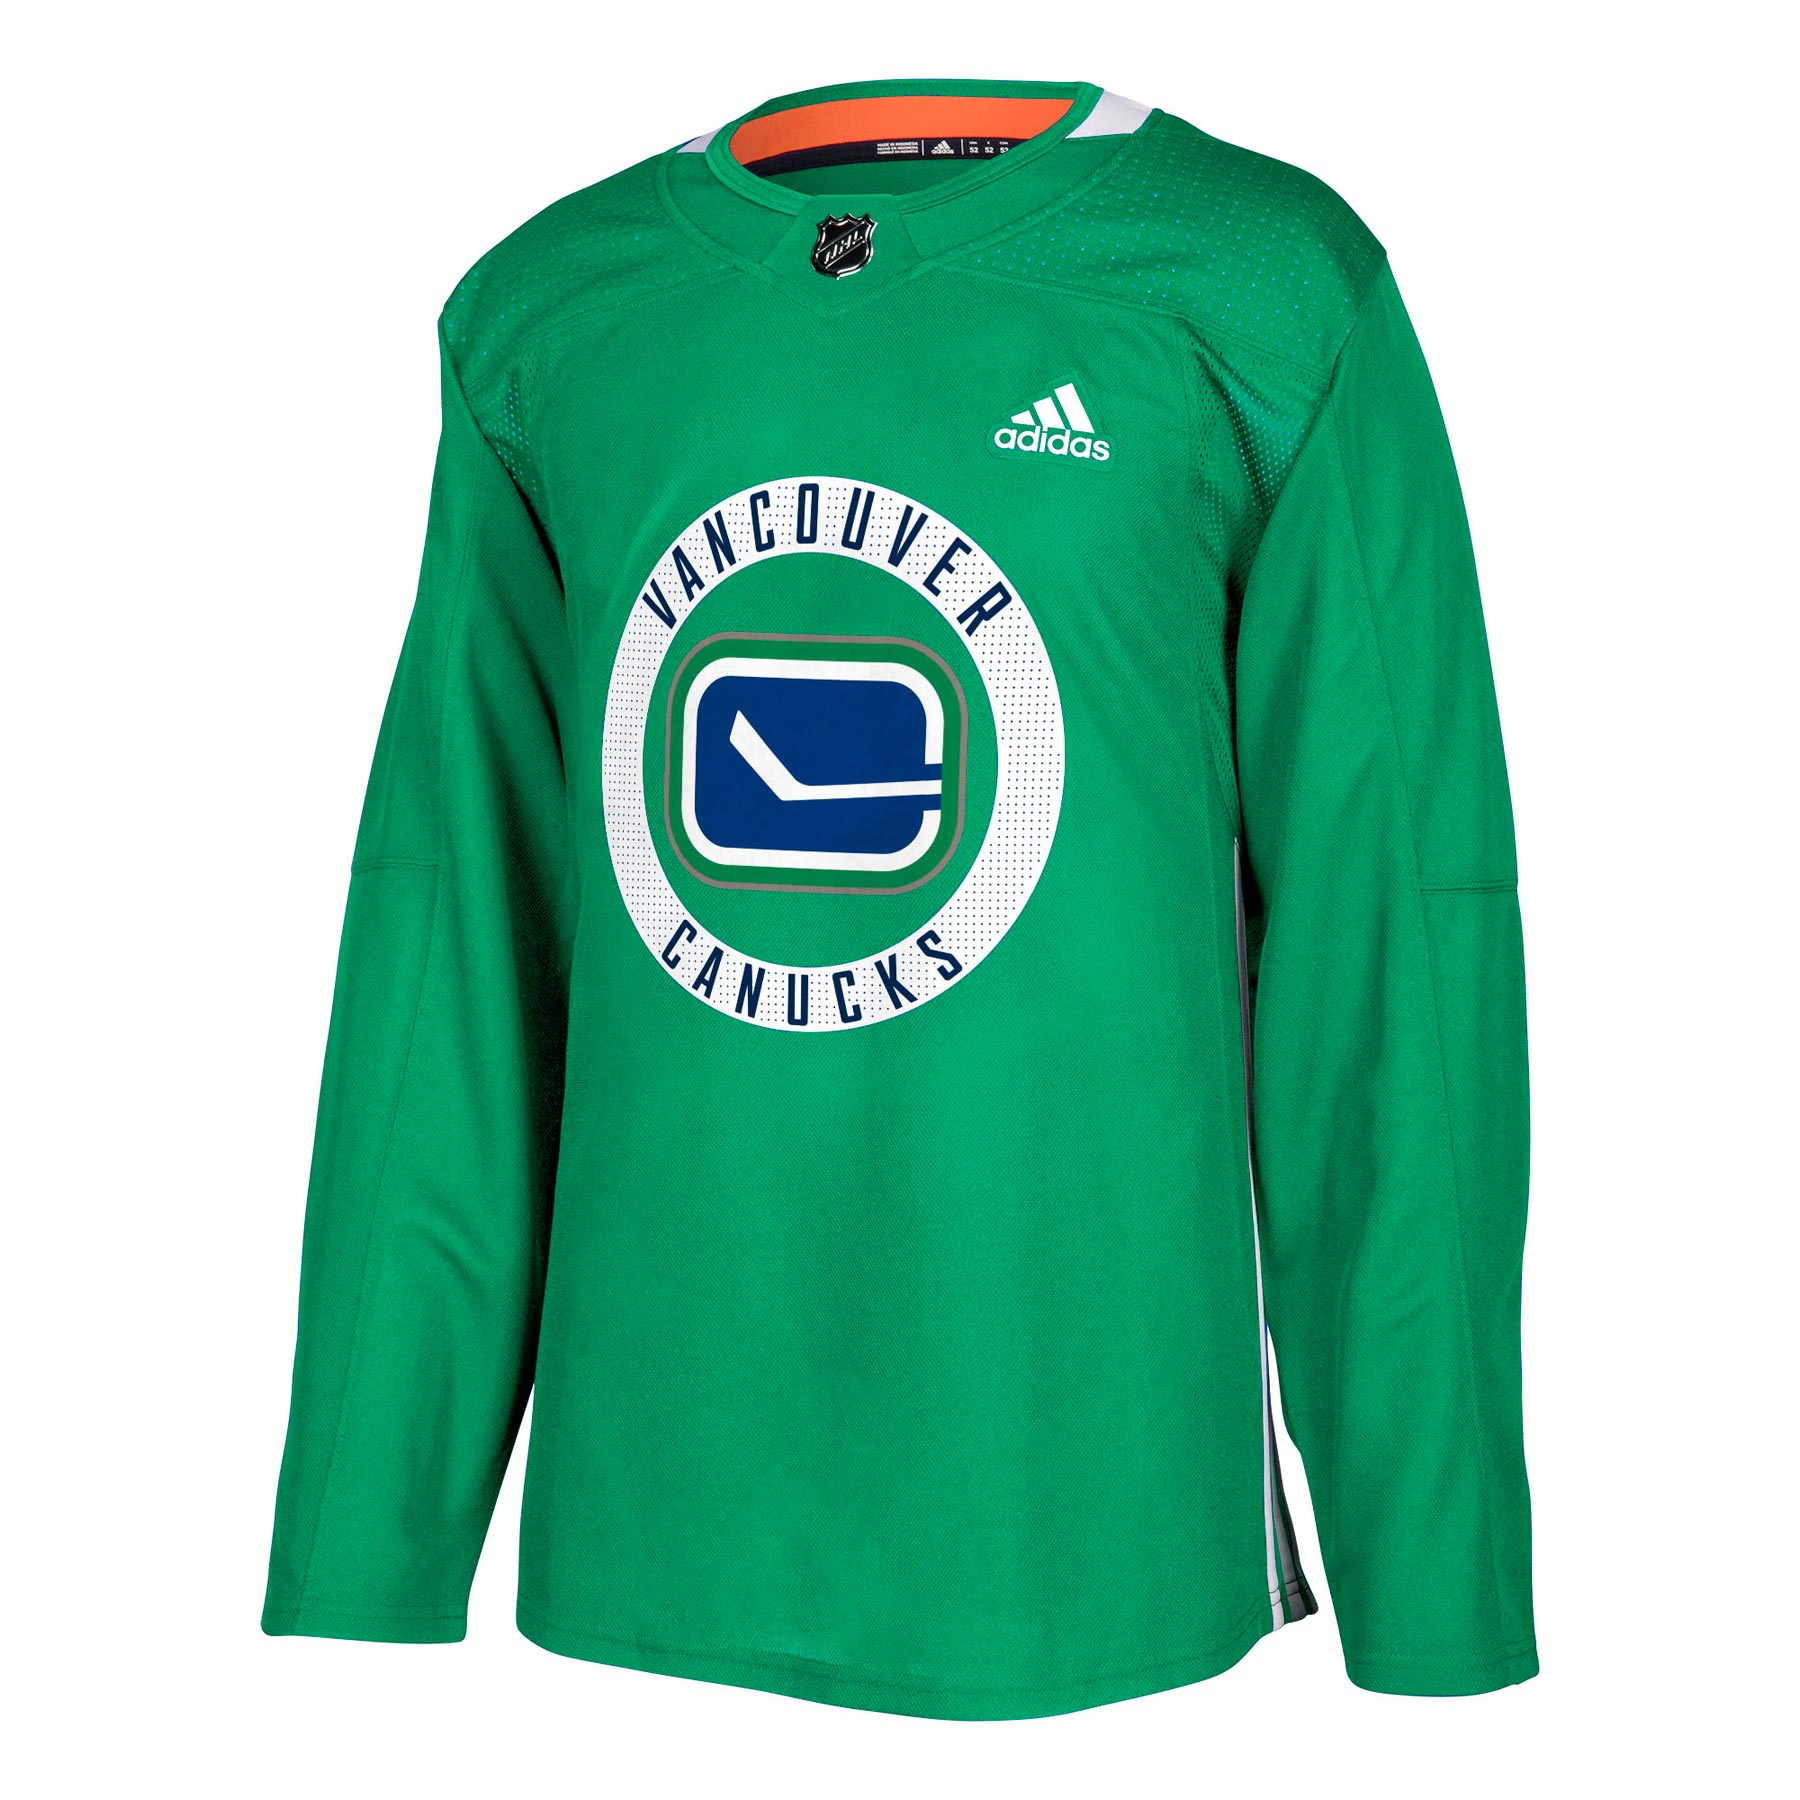 more photos 9e3f9 5292f Vancouver Canucks adidas adizero NHL Authentic Pro Practice Jersey - Green